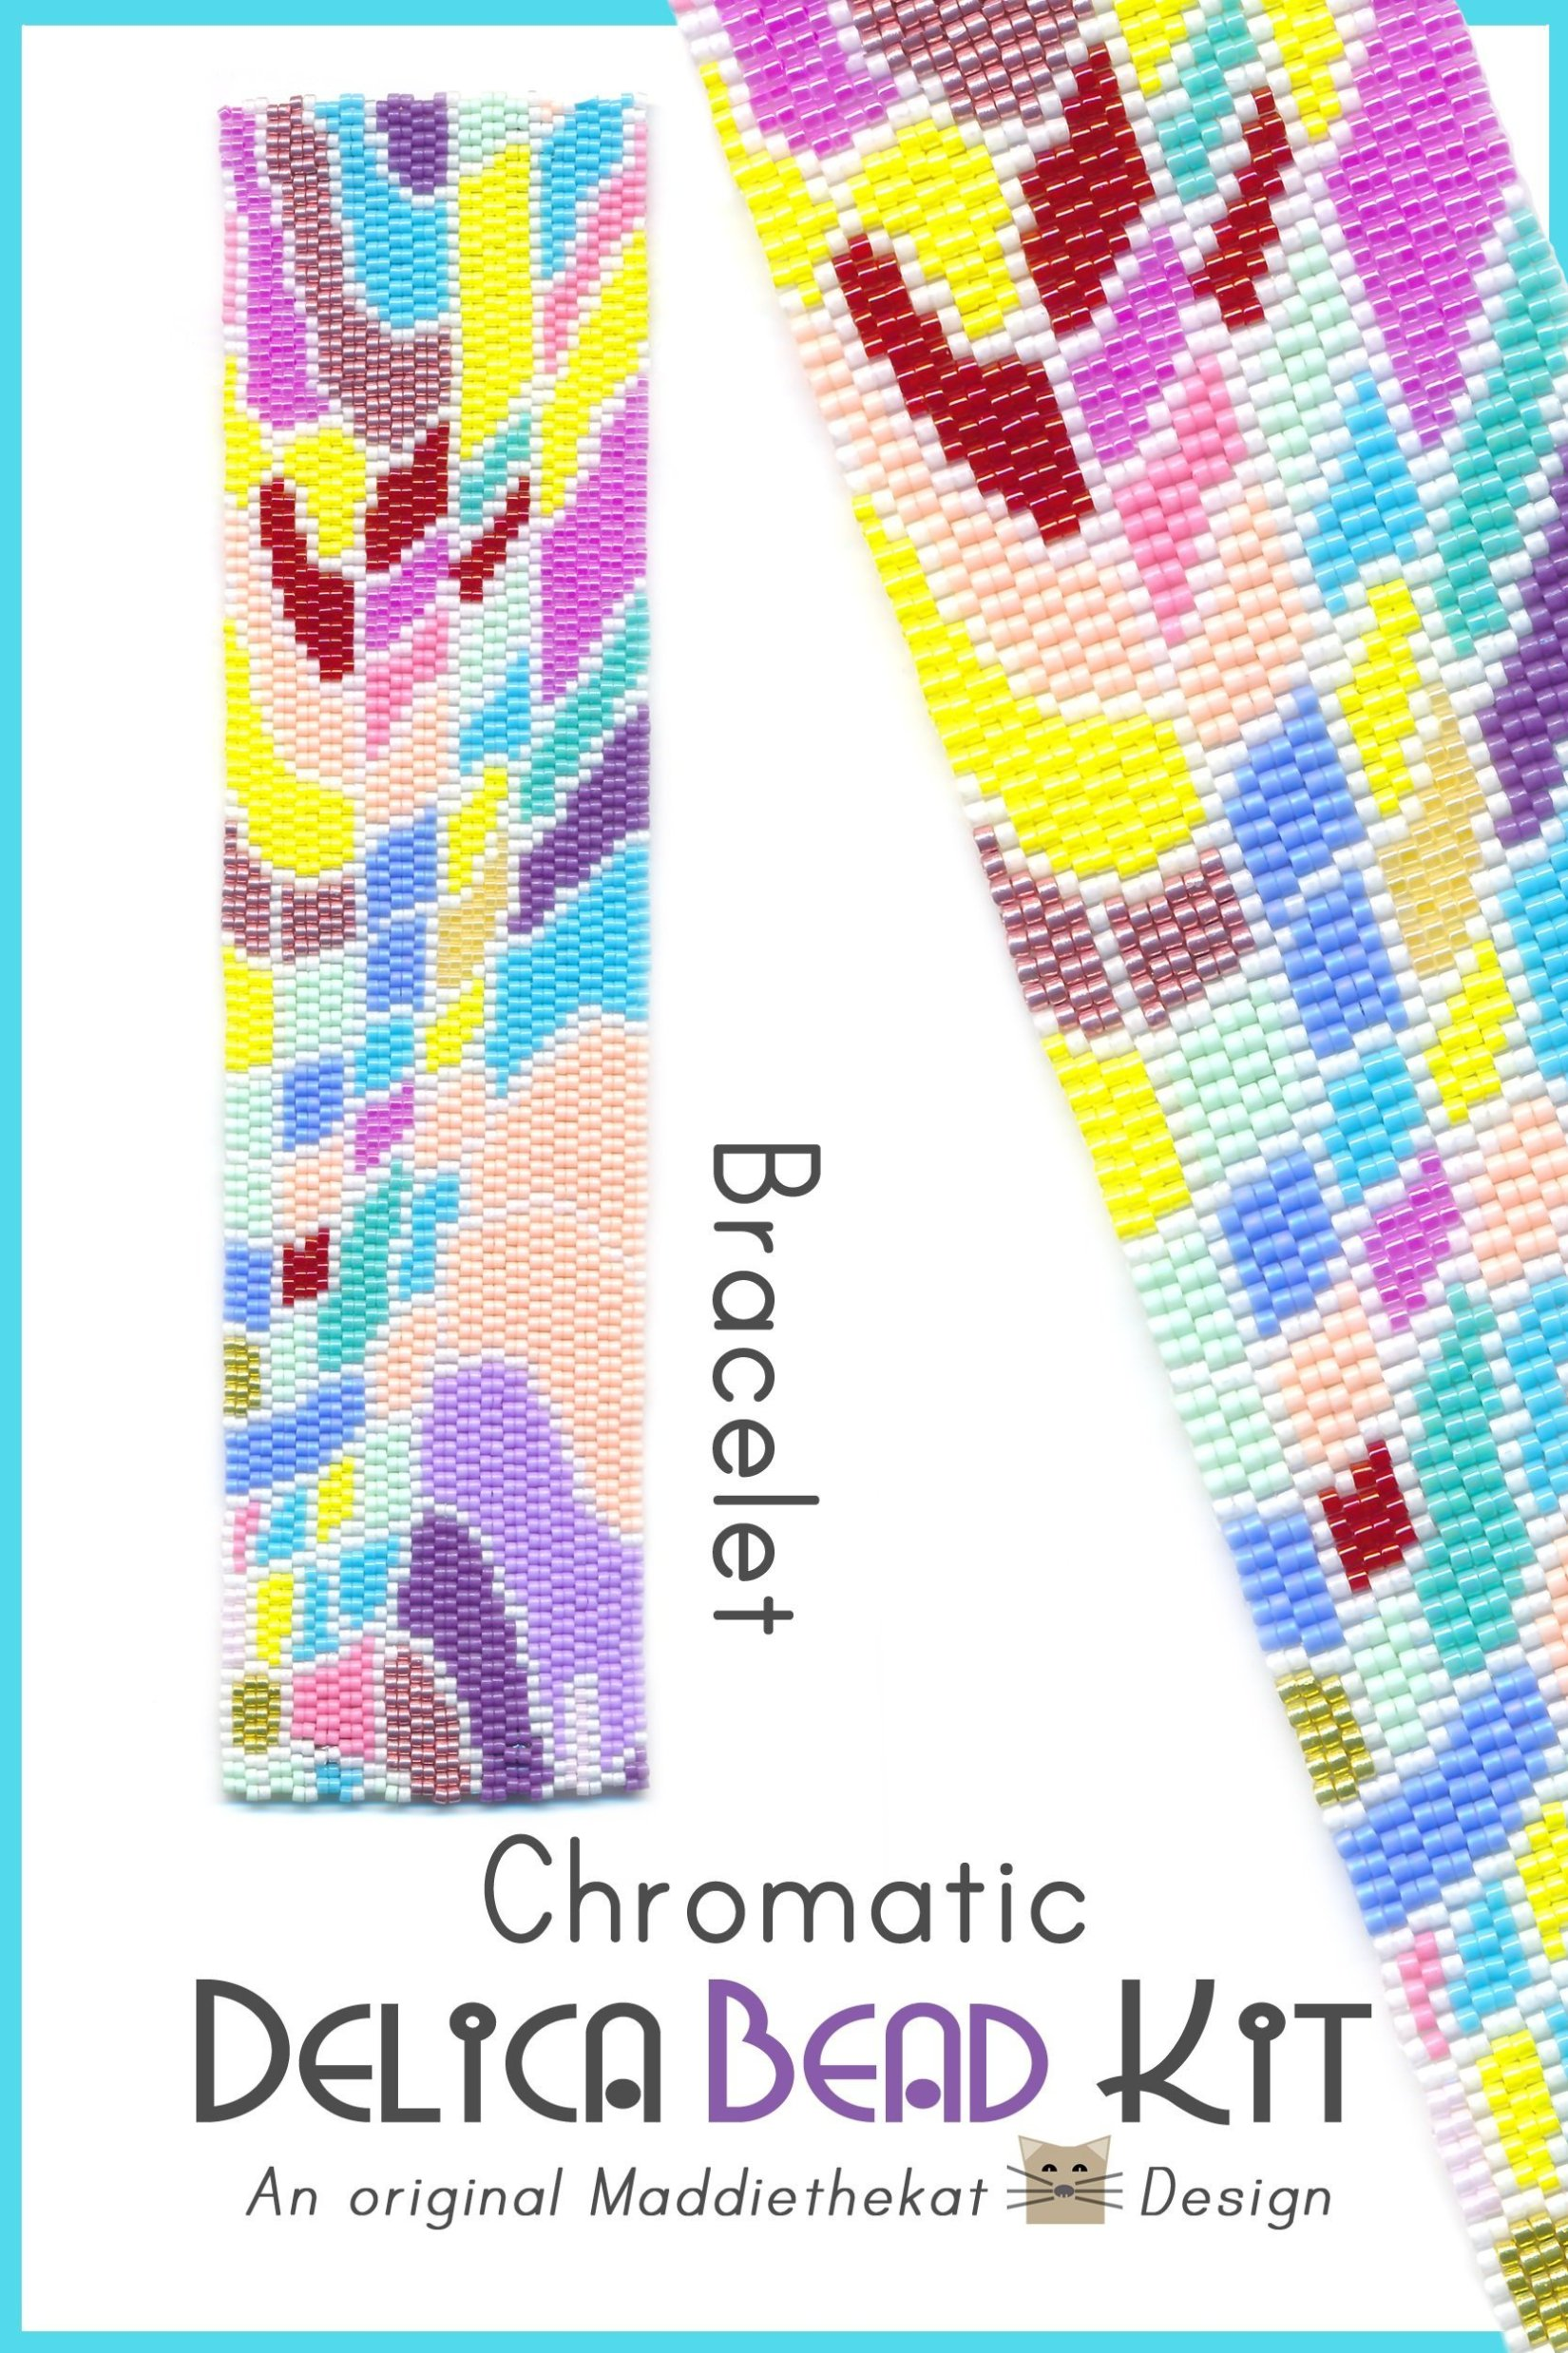 Chromatic Wide Cuff Bracelet 2-Drop Peyote Bead Pattern or Bead Kit